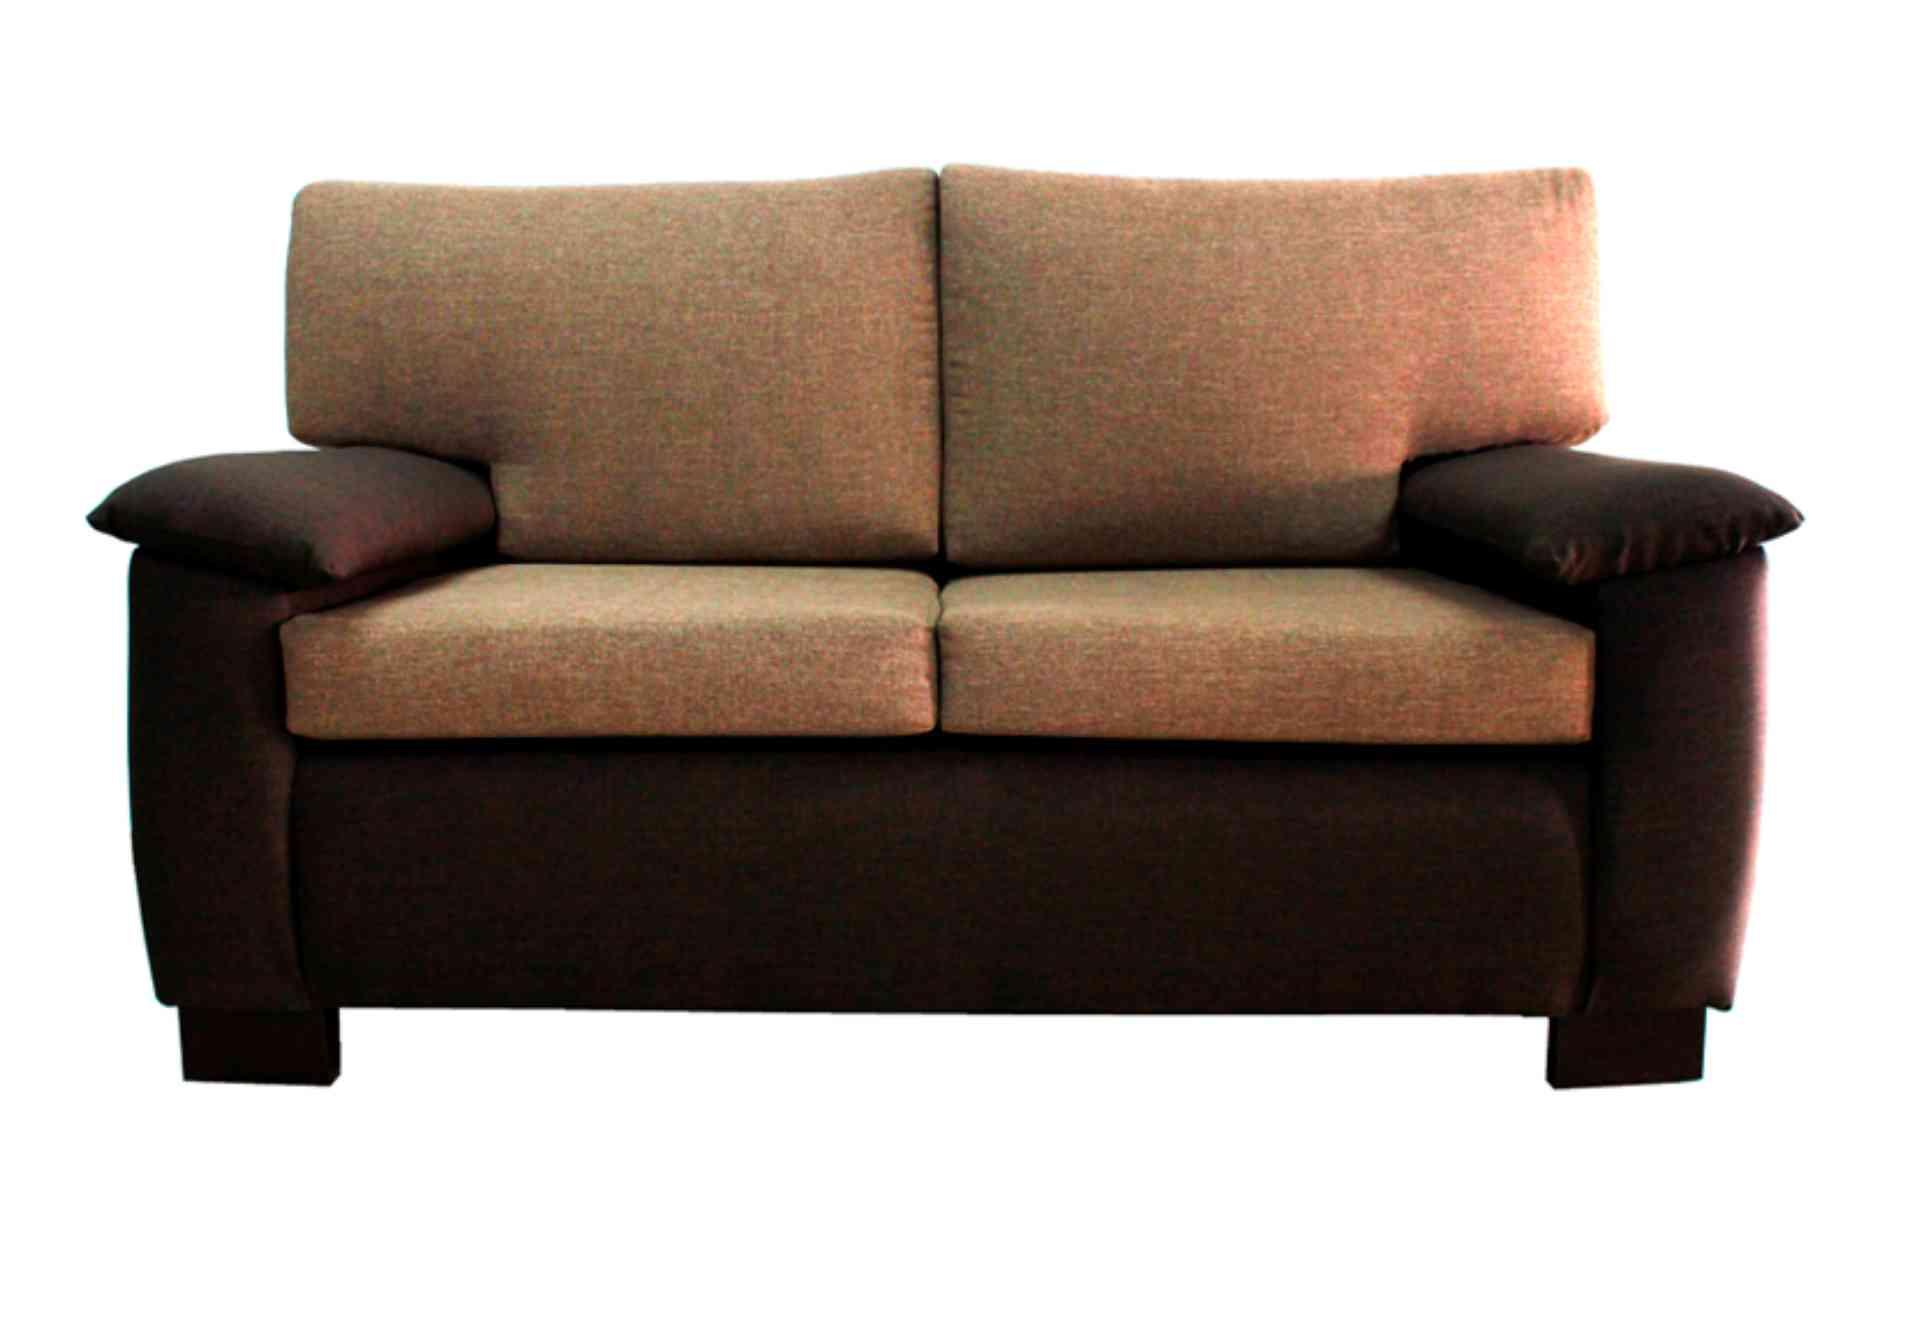 Sofa Muebles el Cid 1801